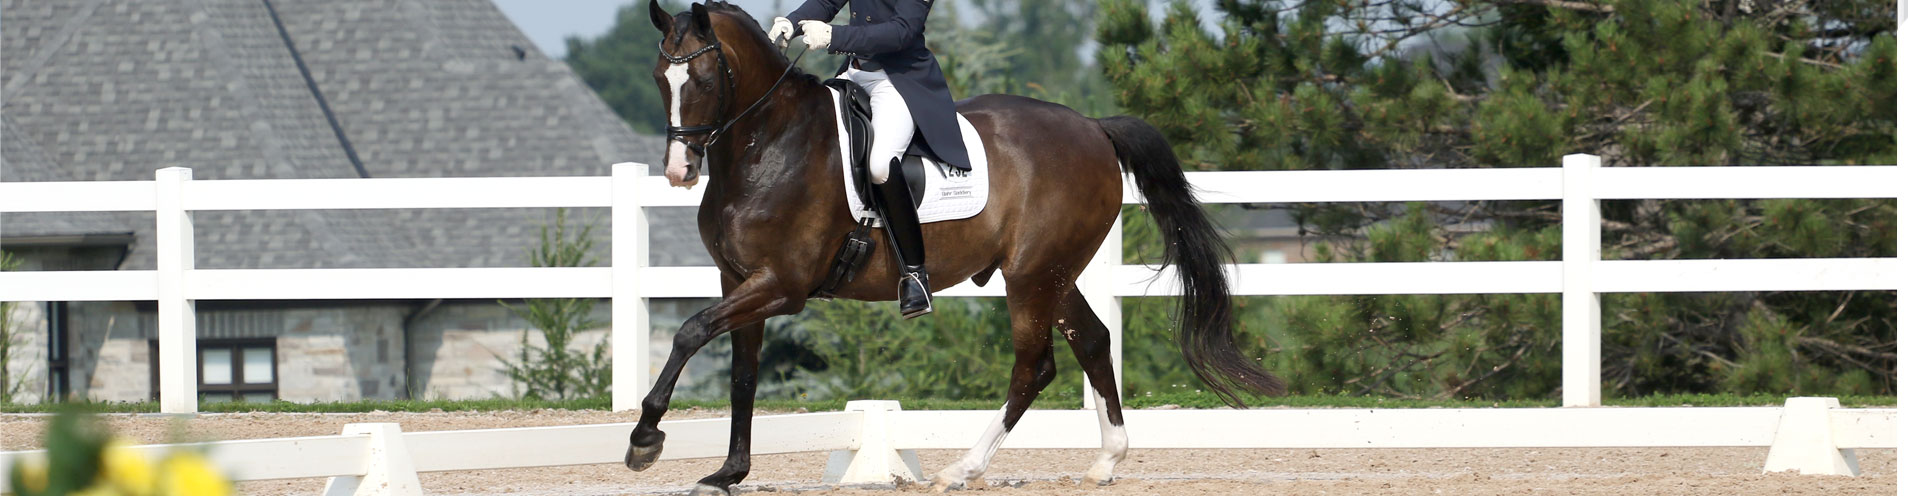 Saddle Fitting Services | Professional Saddle Fitting | Bahr